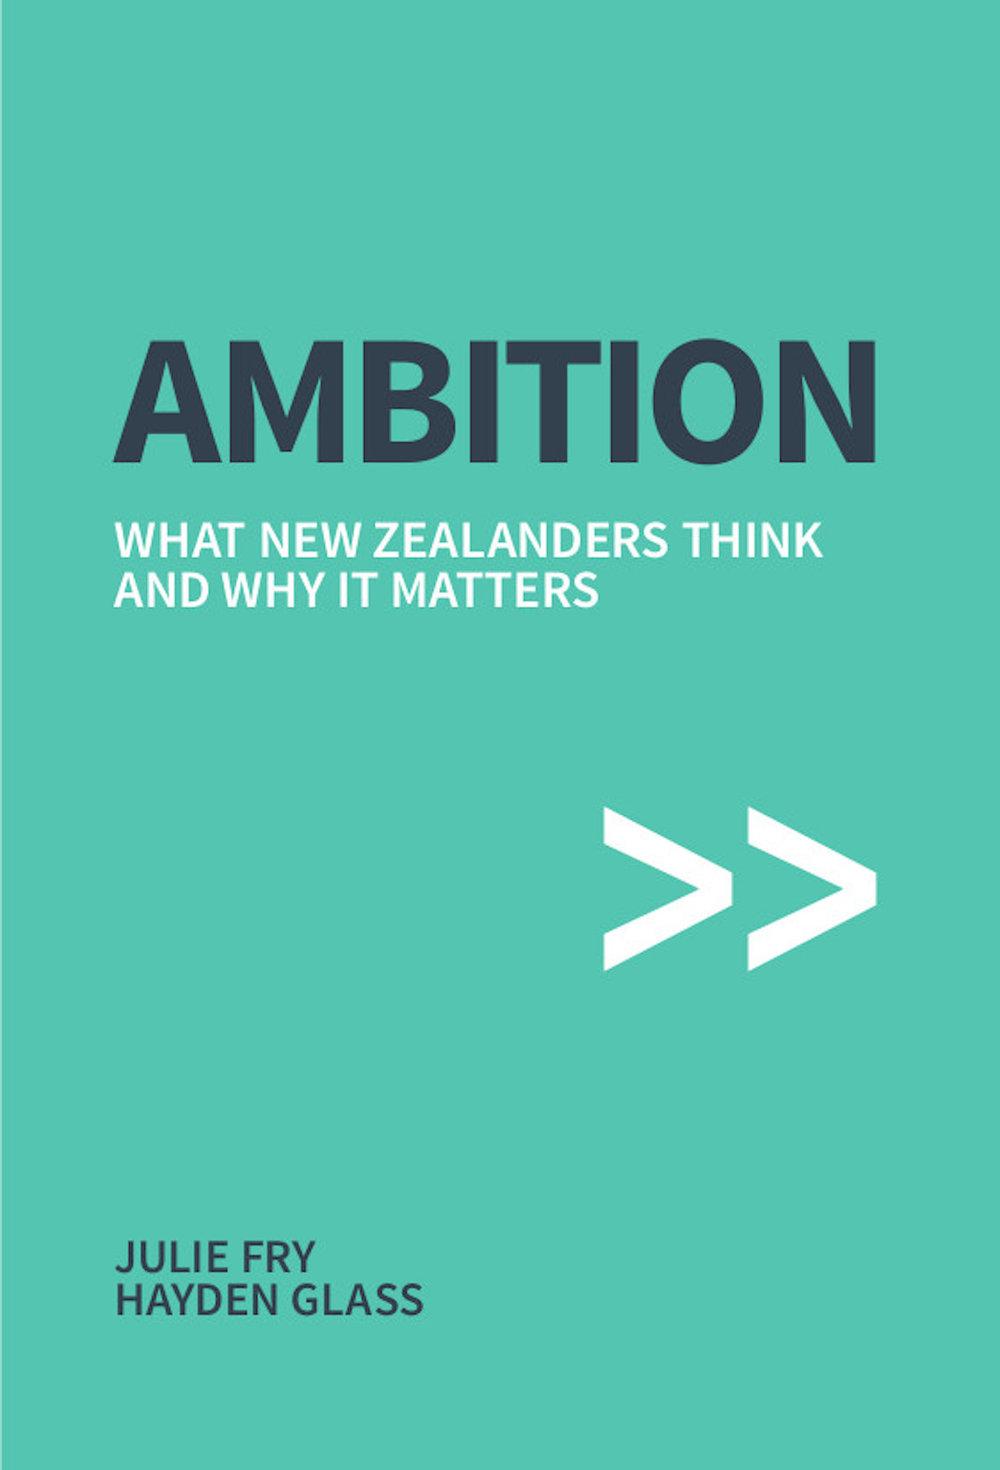 Ambition cover final.pdf 1170px copy.jpg